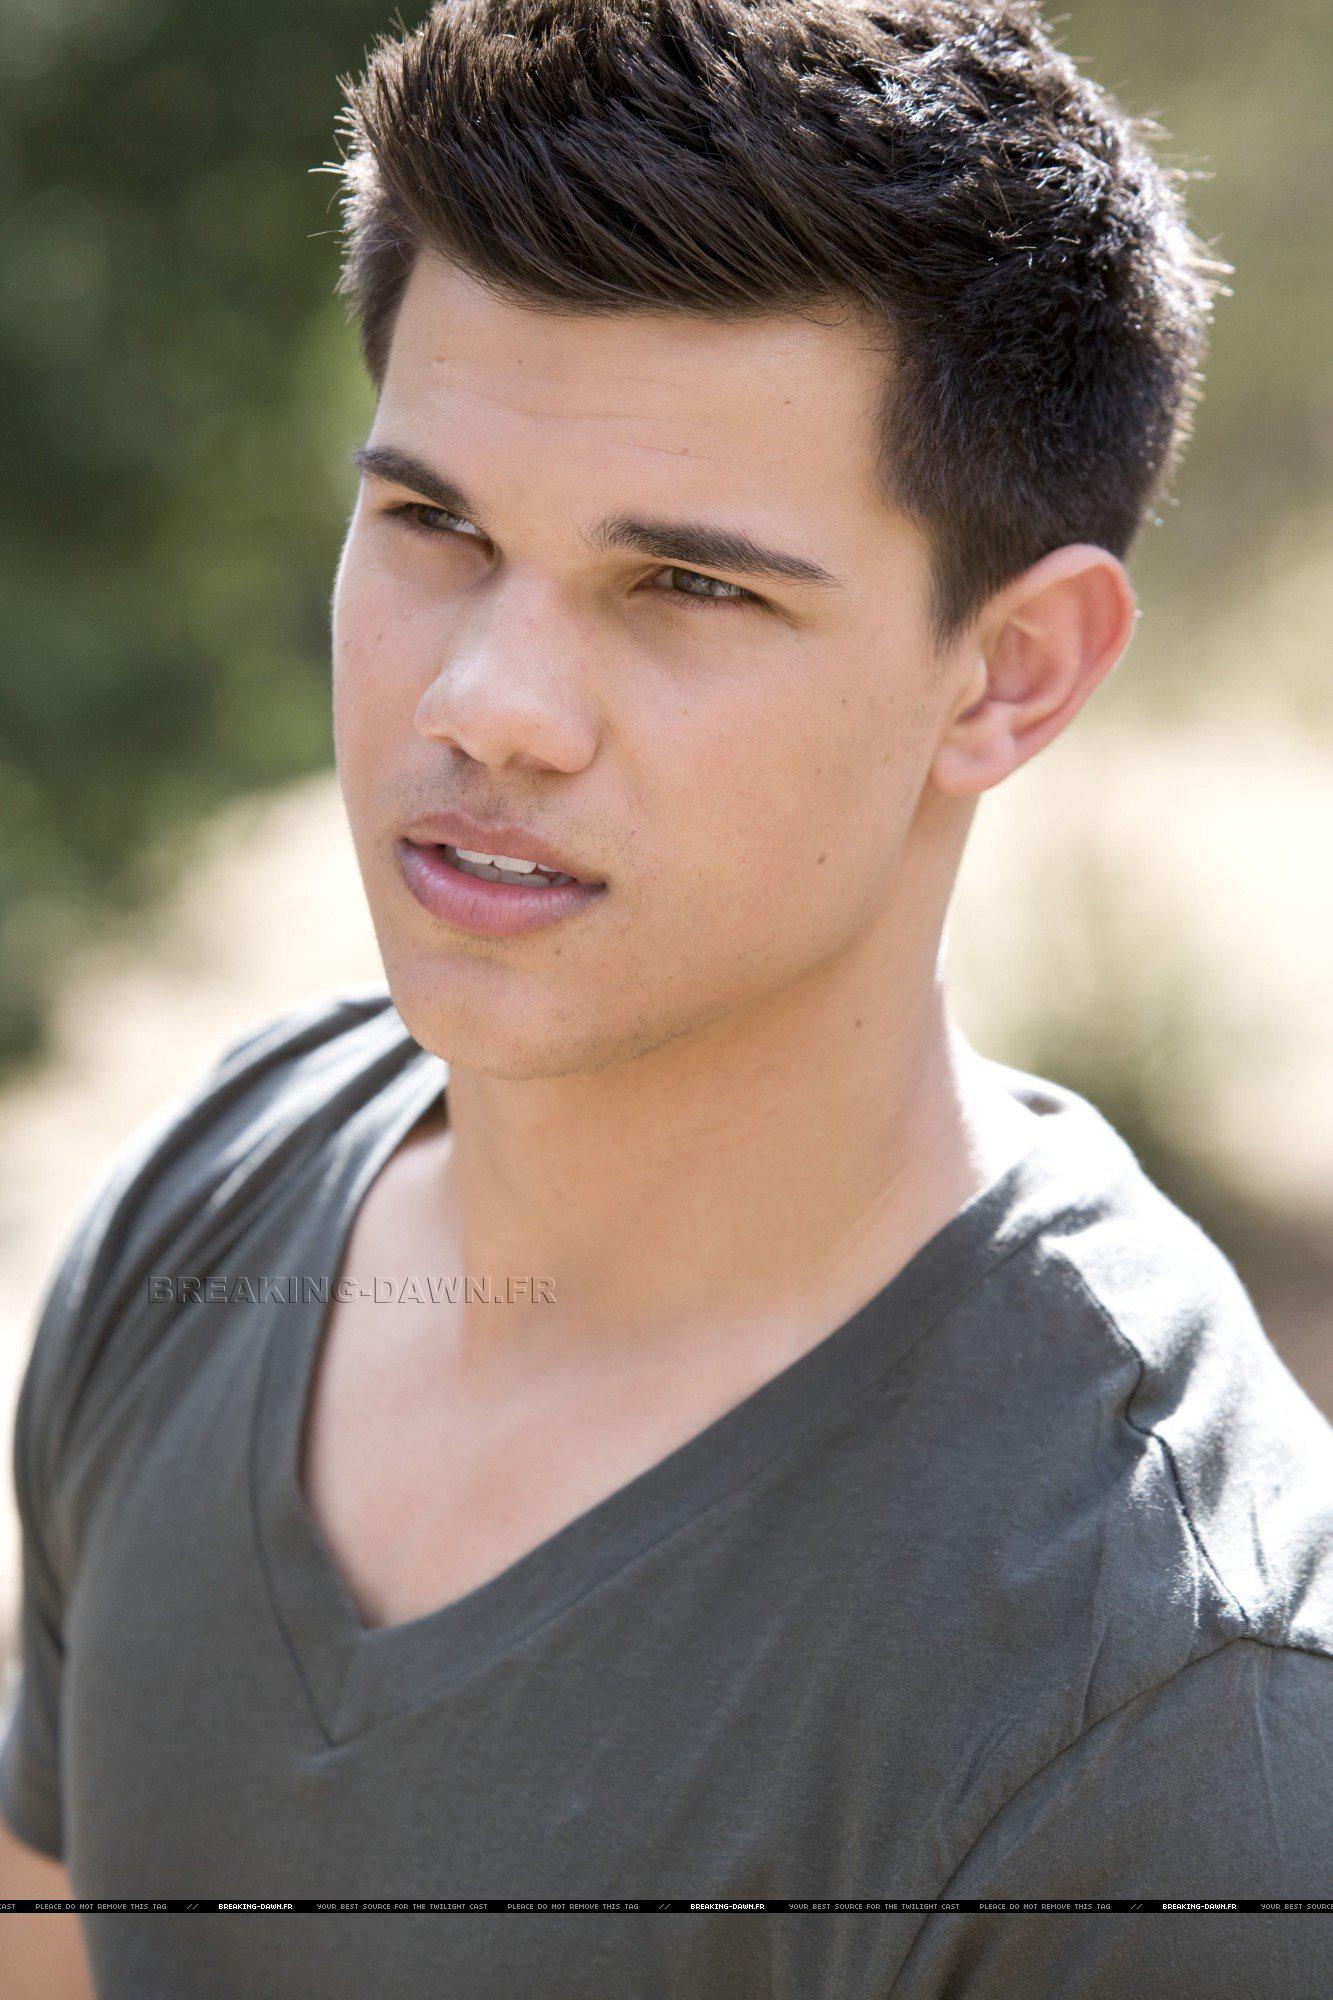 Taylor - Hot Guys Photo (8912683) - Fanpop Taylor Lautner